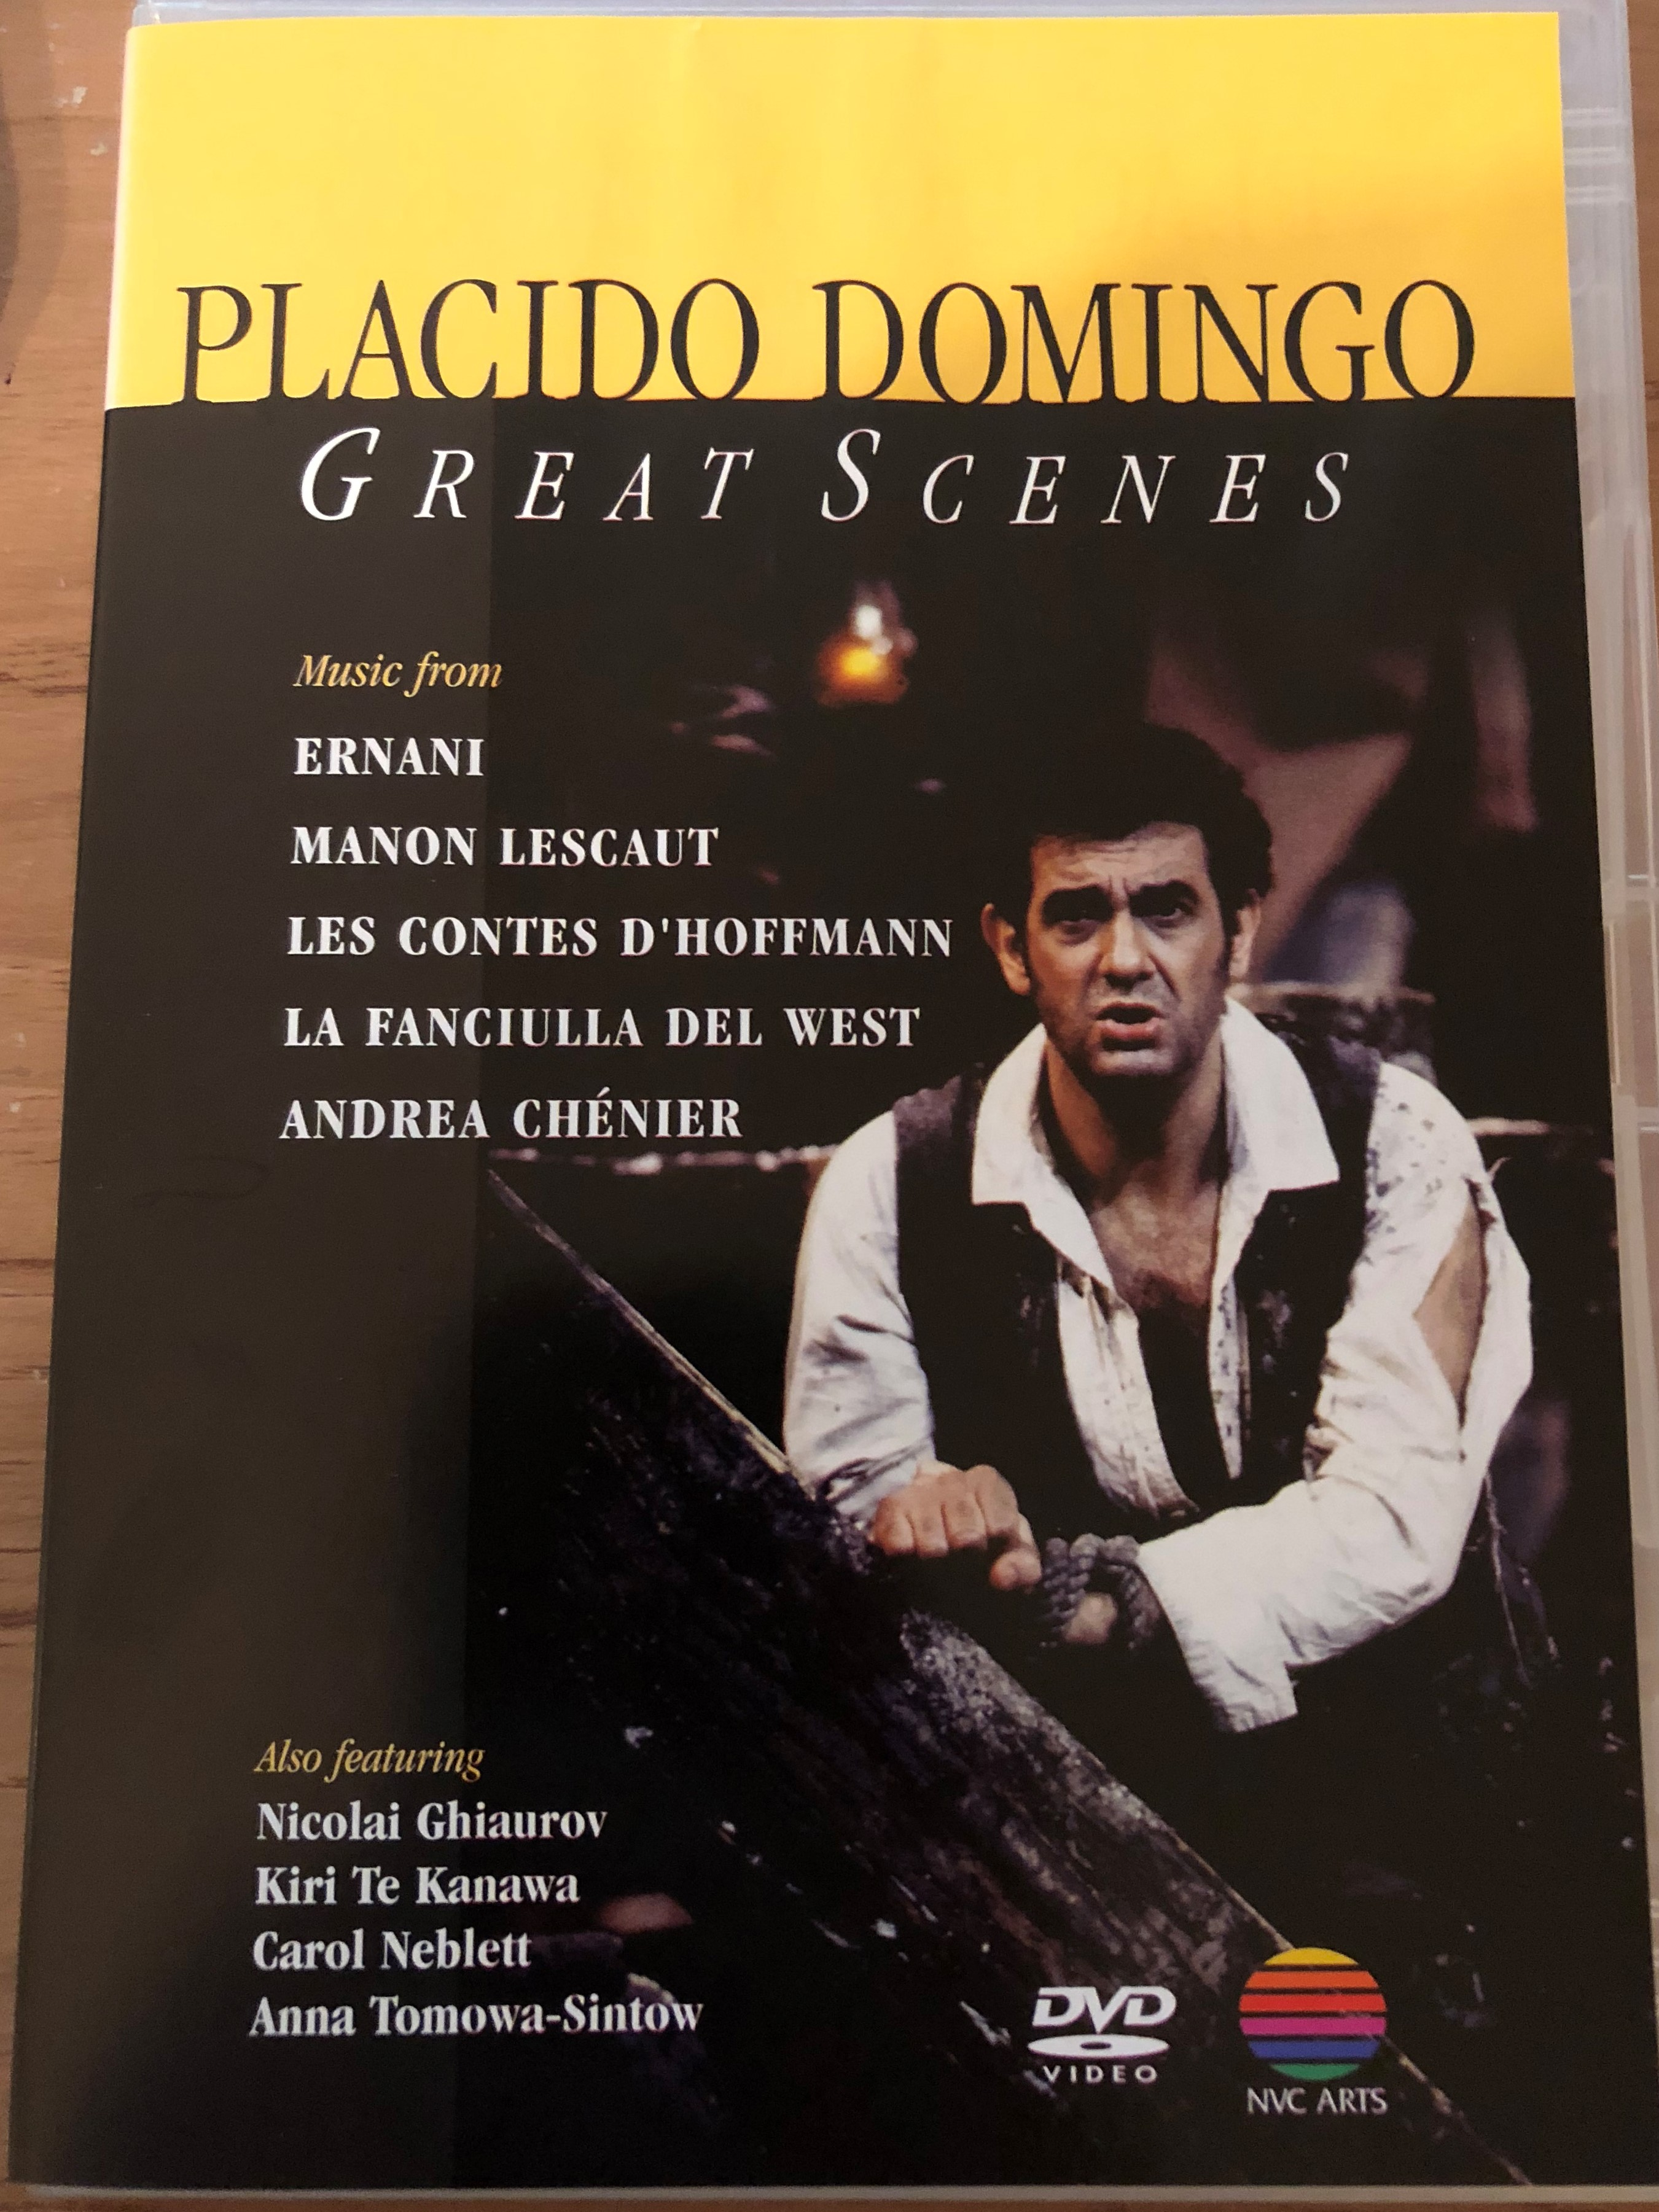 placido-domingo-great-scenes-dvd-1990-music-from-ernani-manon-lescaut-les-contes-d-hoffmann-featuring-nicolai-ghiaurov-kiri-te-kanawa-carol-neblett-anna-tomowa-sintow-nvc-arts-1-.jpg